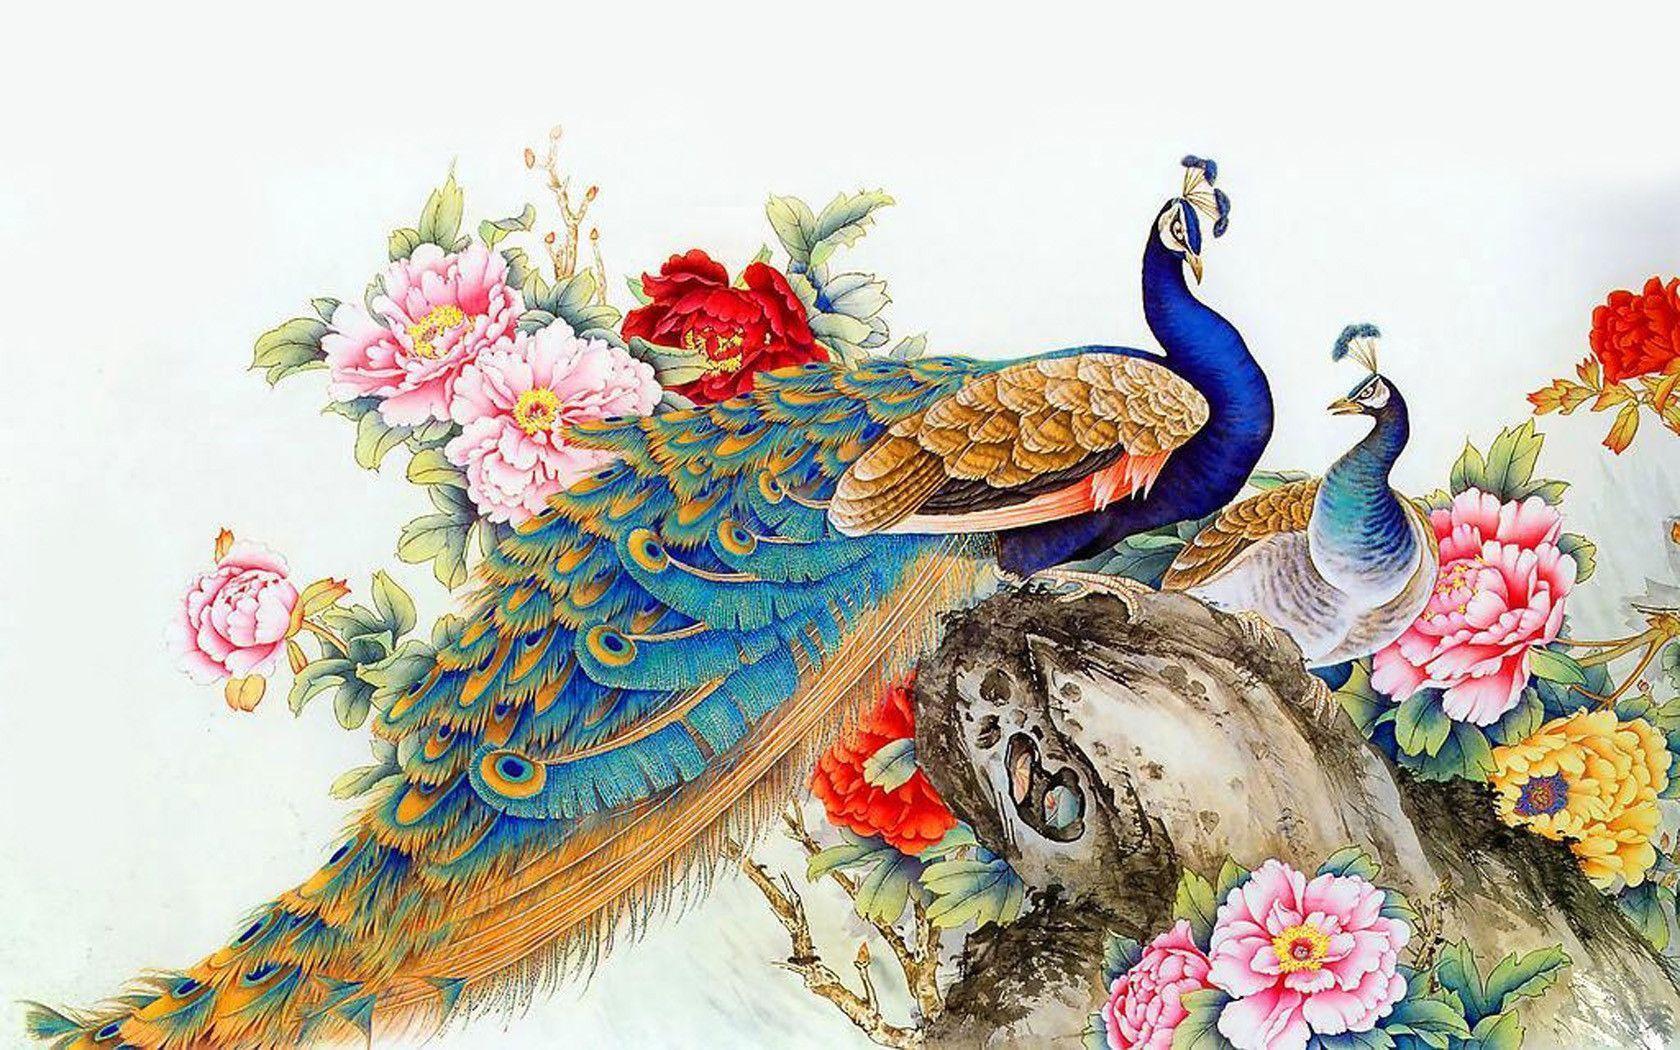 peacock wallpaper backgrounds